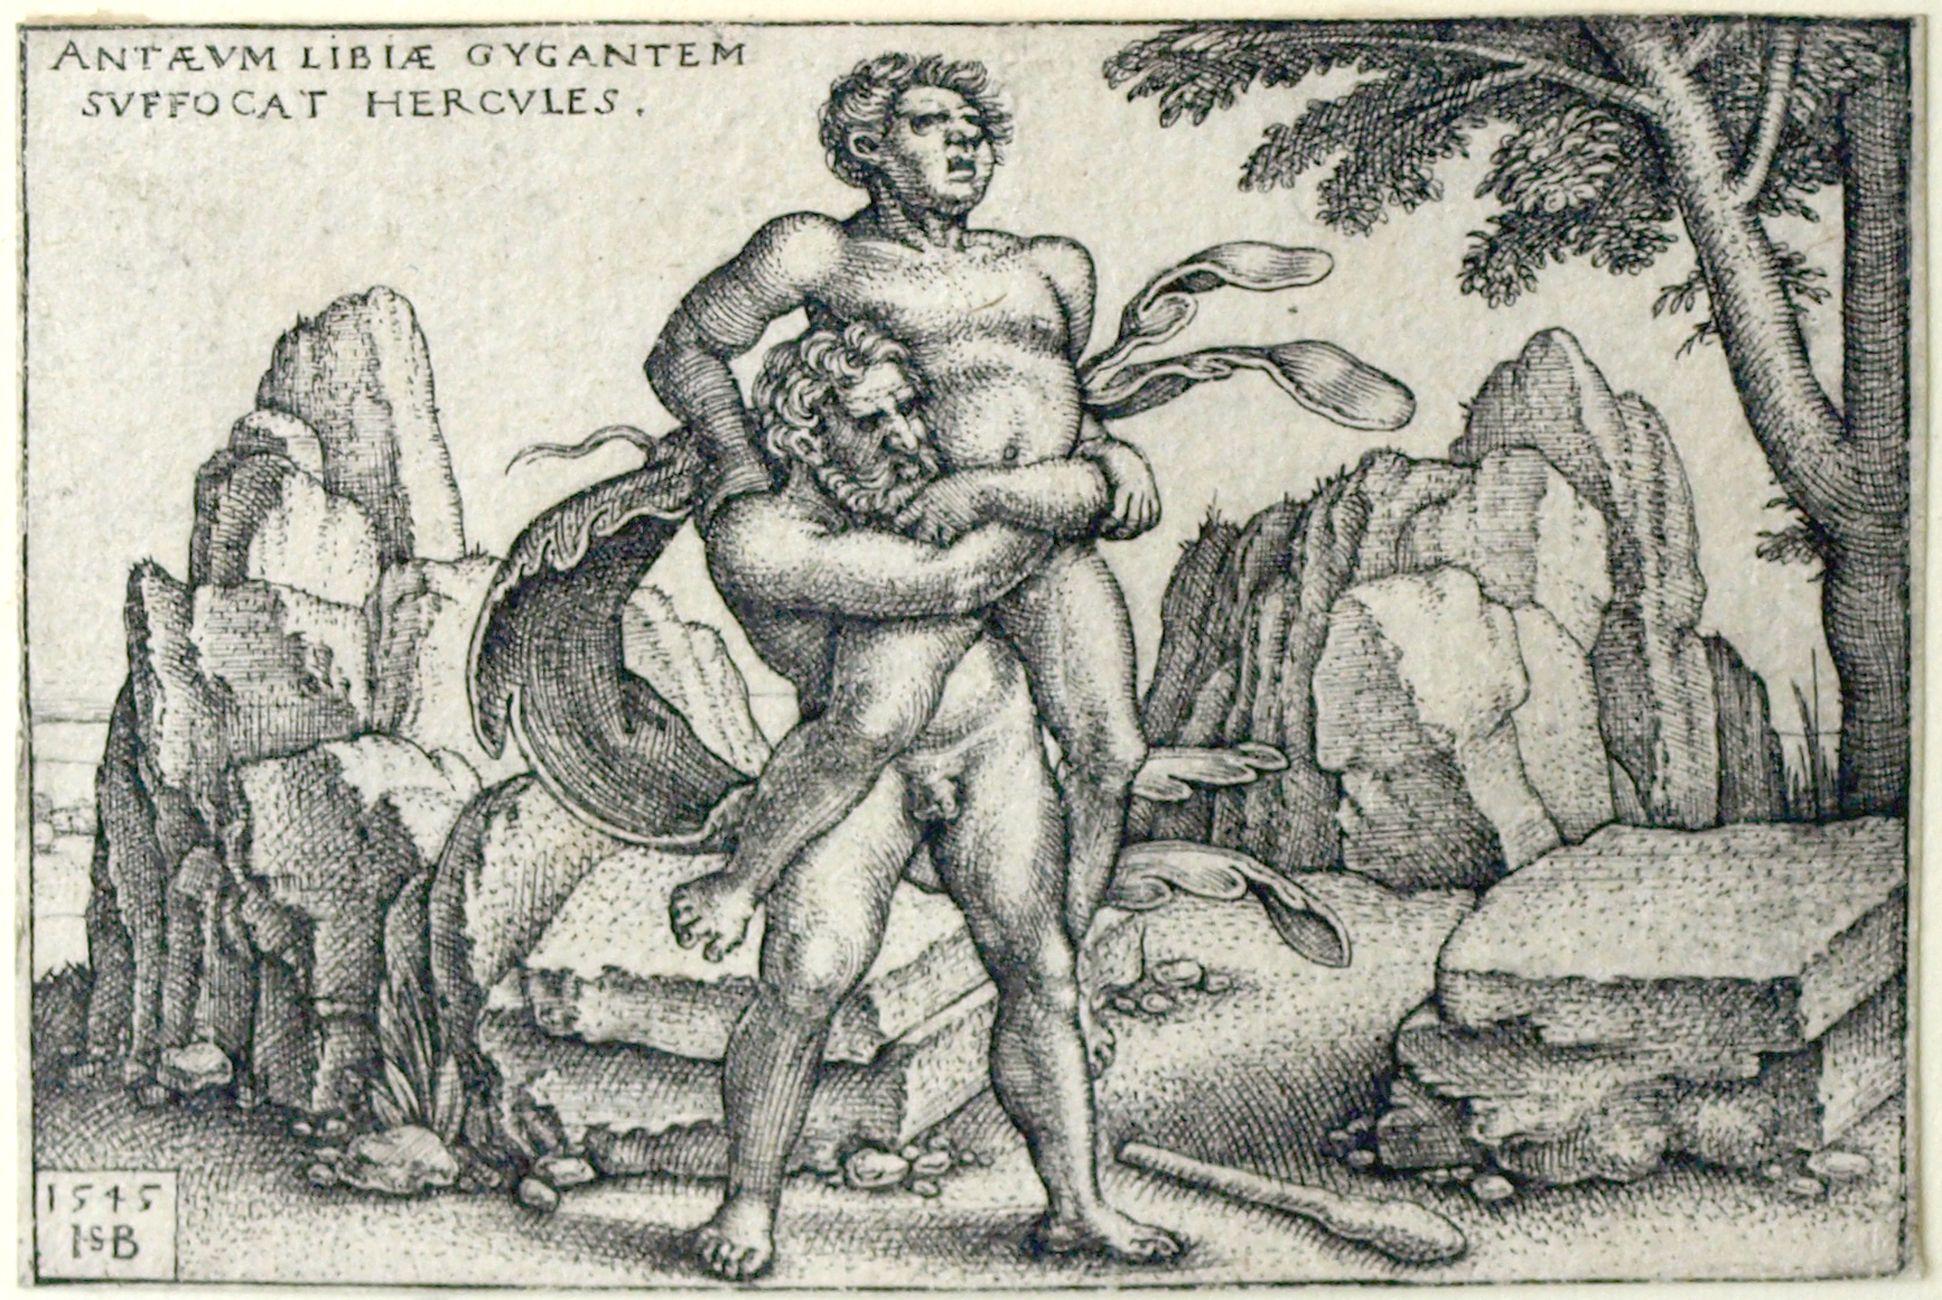 The deeds of Hercules Hercules strangles the giant Anteus of Libya to death, 48 x70 mm